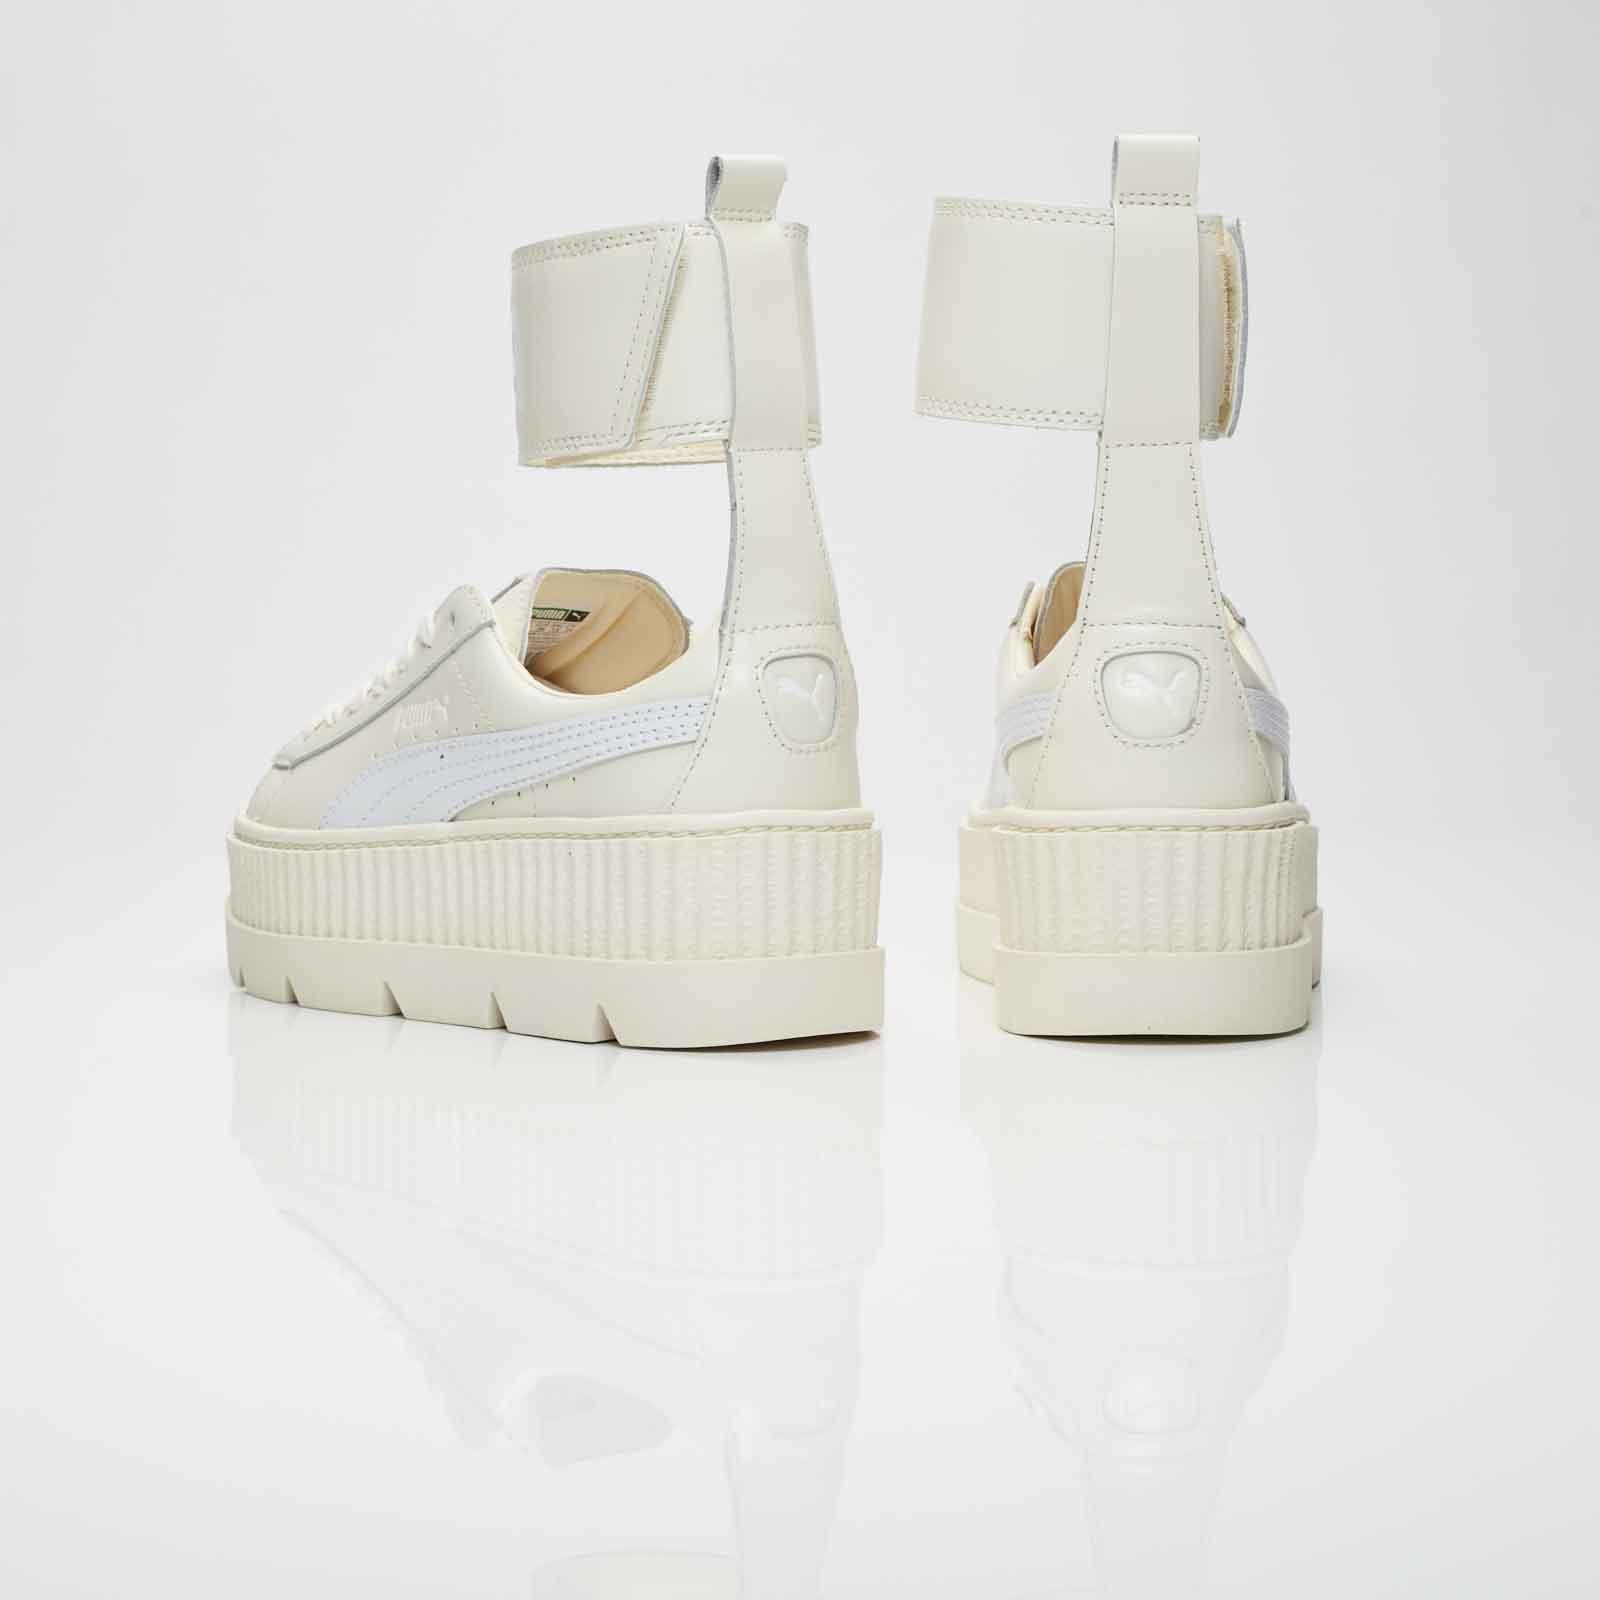 reputable site 0780e 97281 Puma Ankle Strap Sneaker Wns - 366264-02 - Sneakersnstuff ...